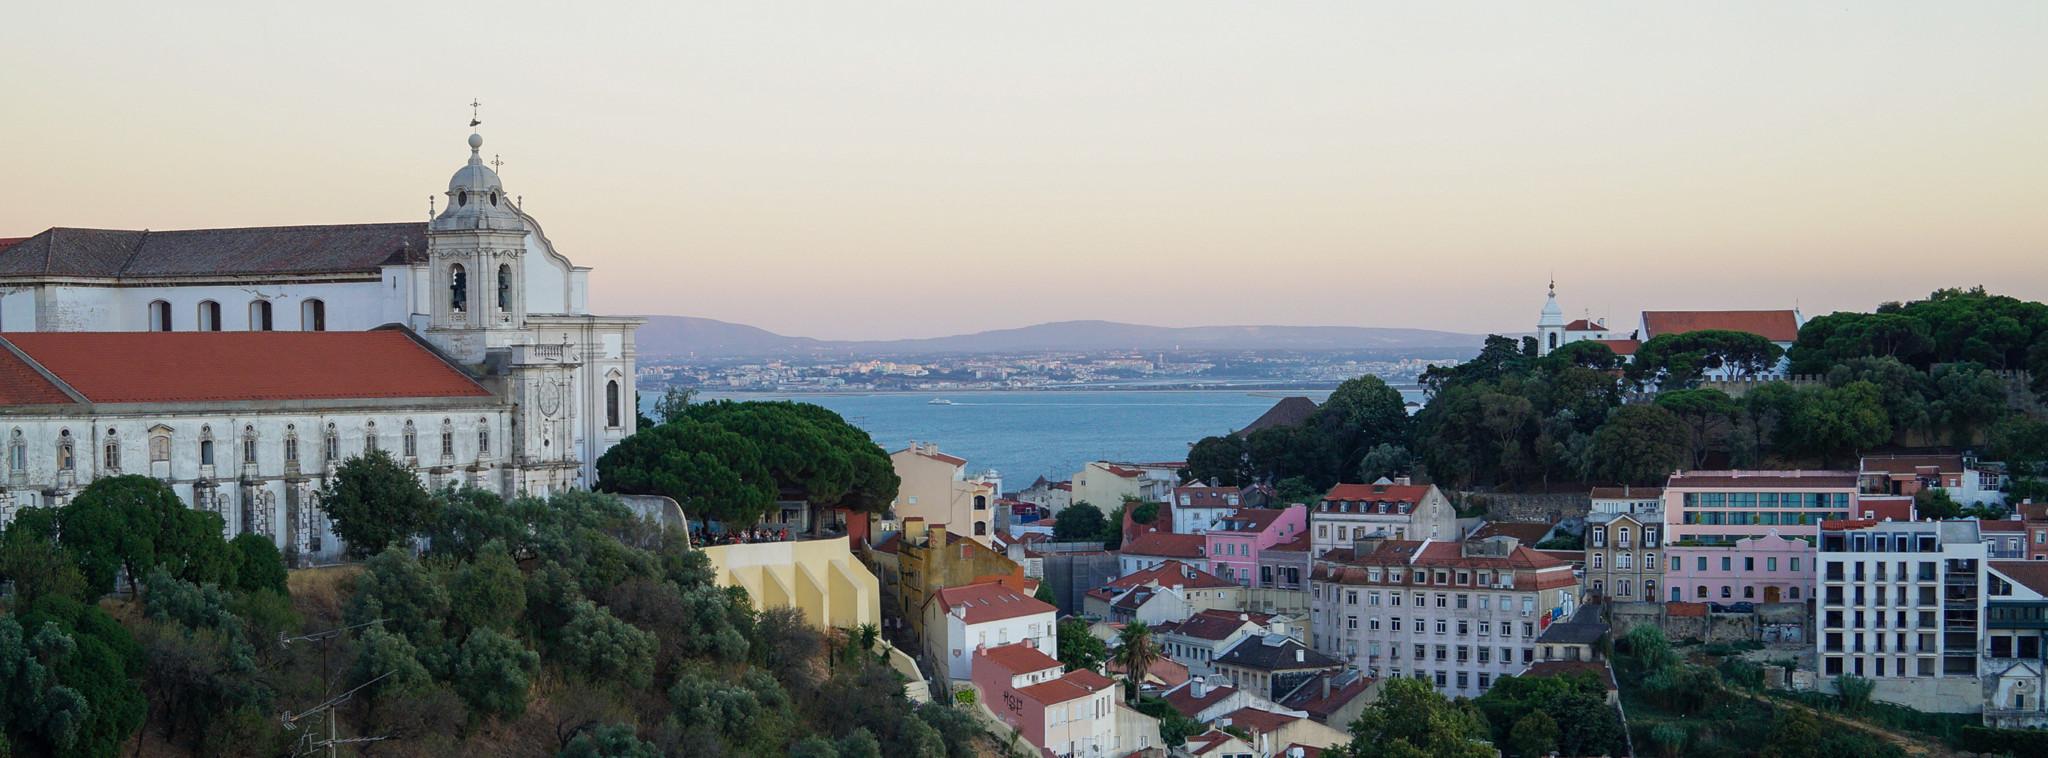 Miradouro in Lissabon